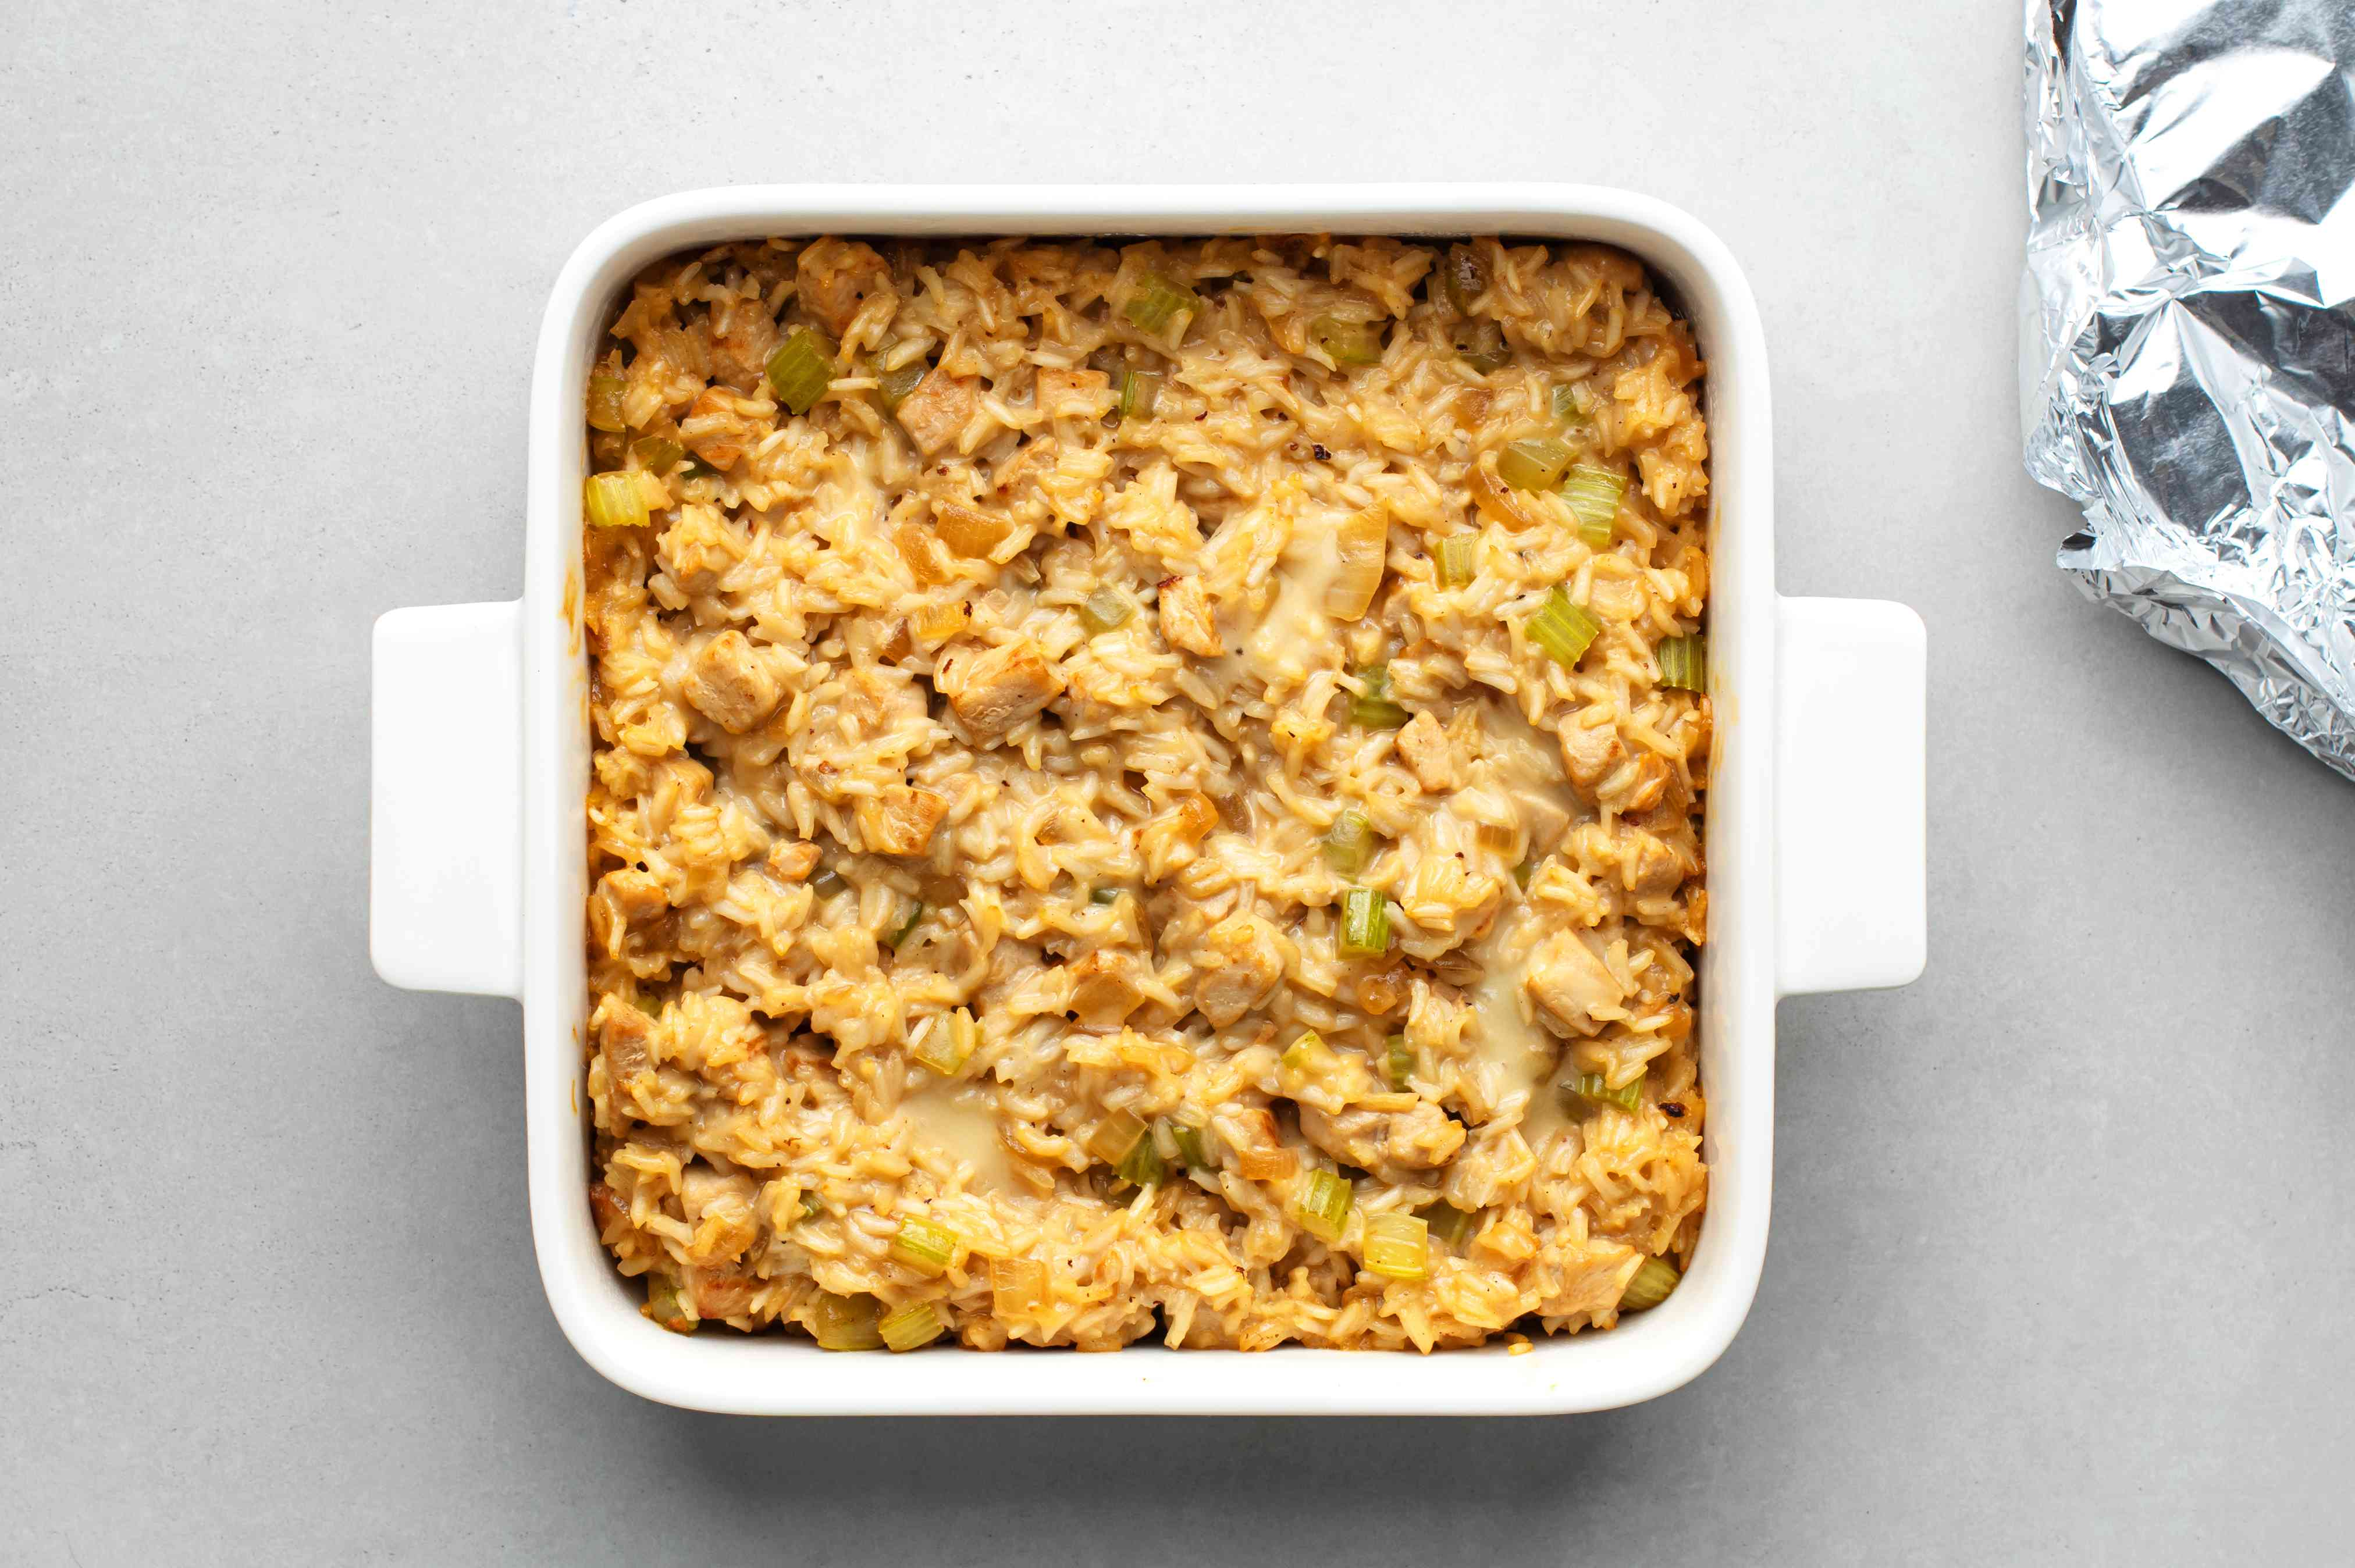 baked Pork, Rice, and Celery Casserole